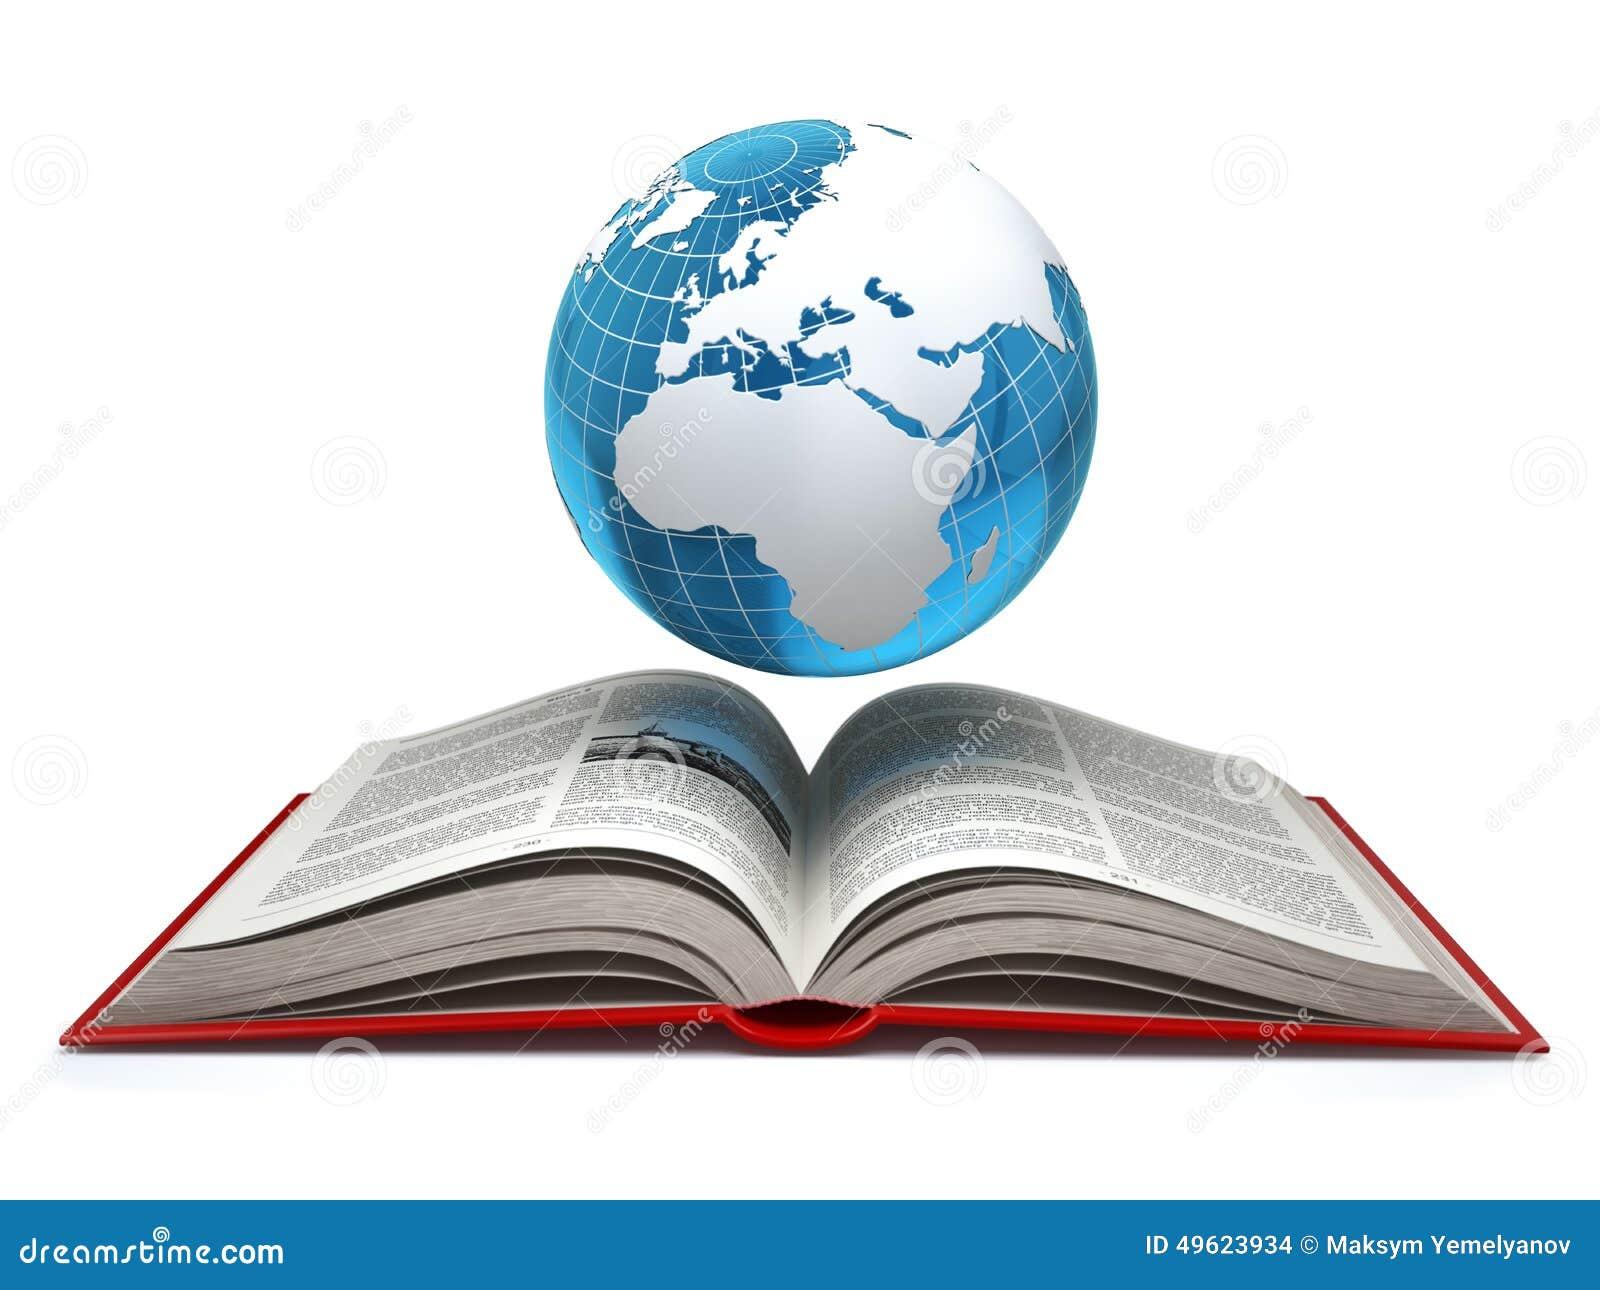 shop Education Nation: Six Leading Edges